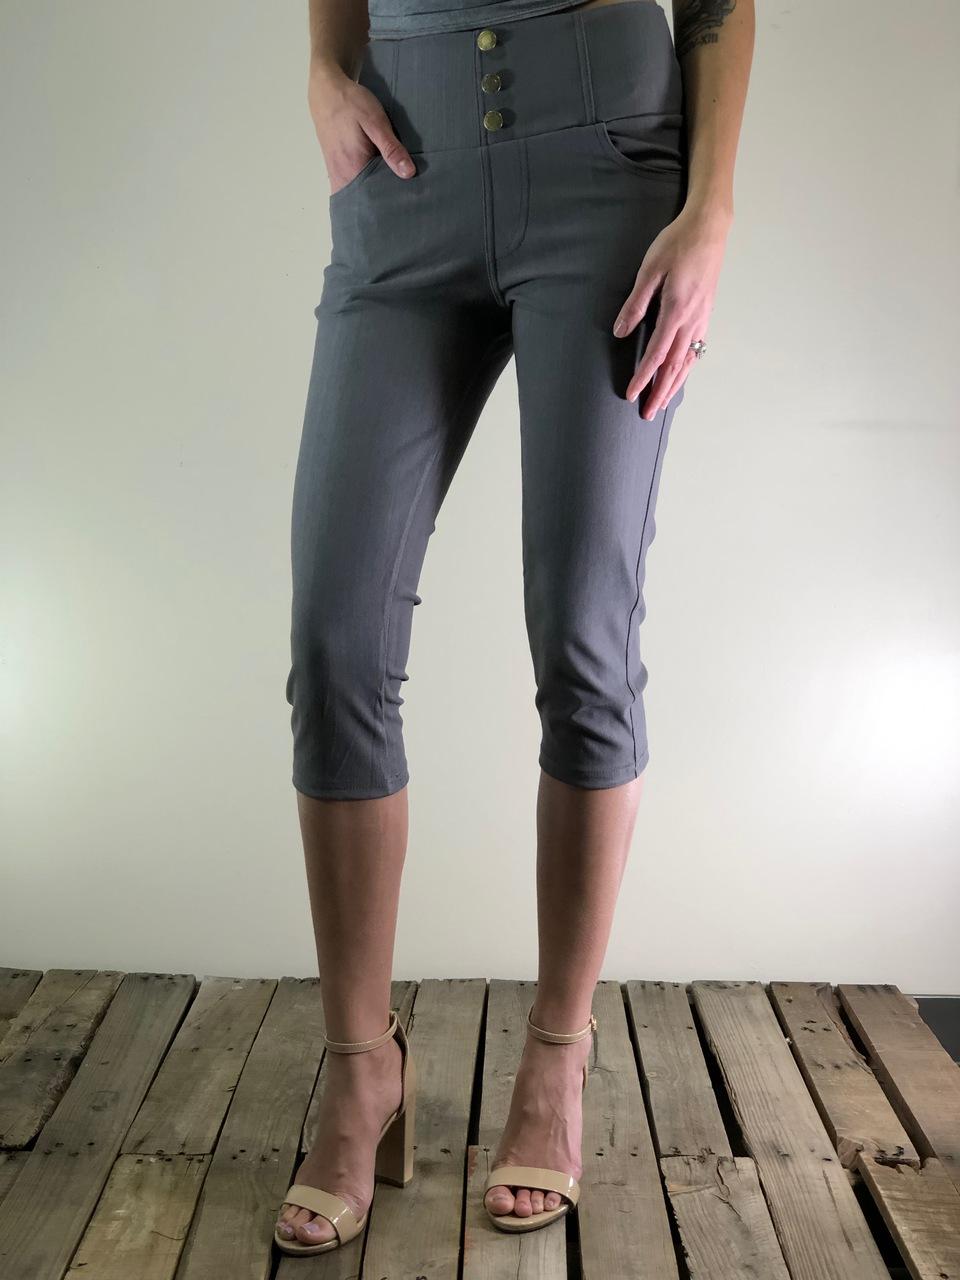 f177a425bca97 Capri Stretchy Jeggings- Grey - Legging Army